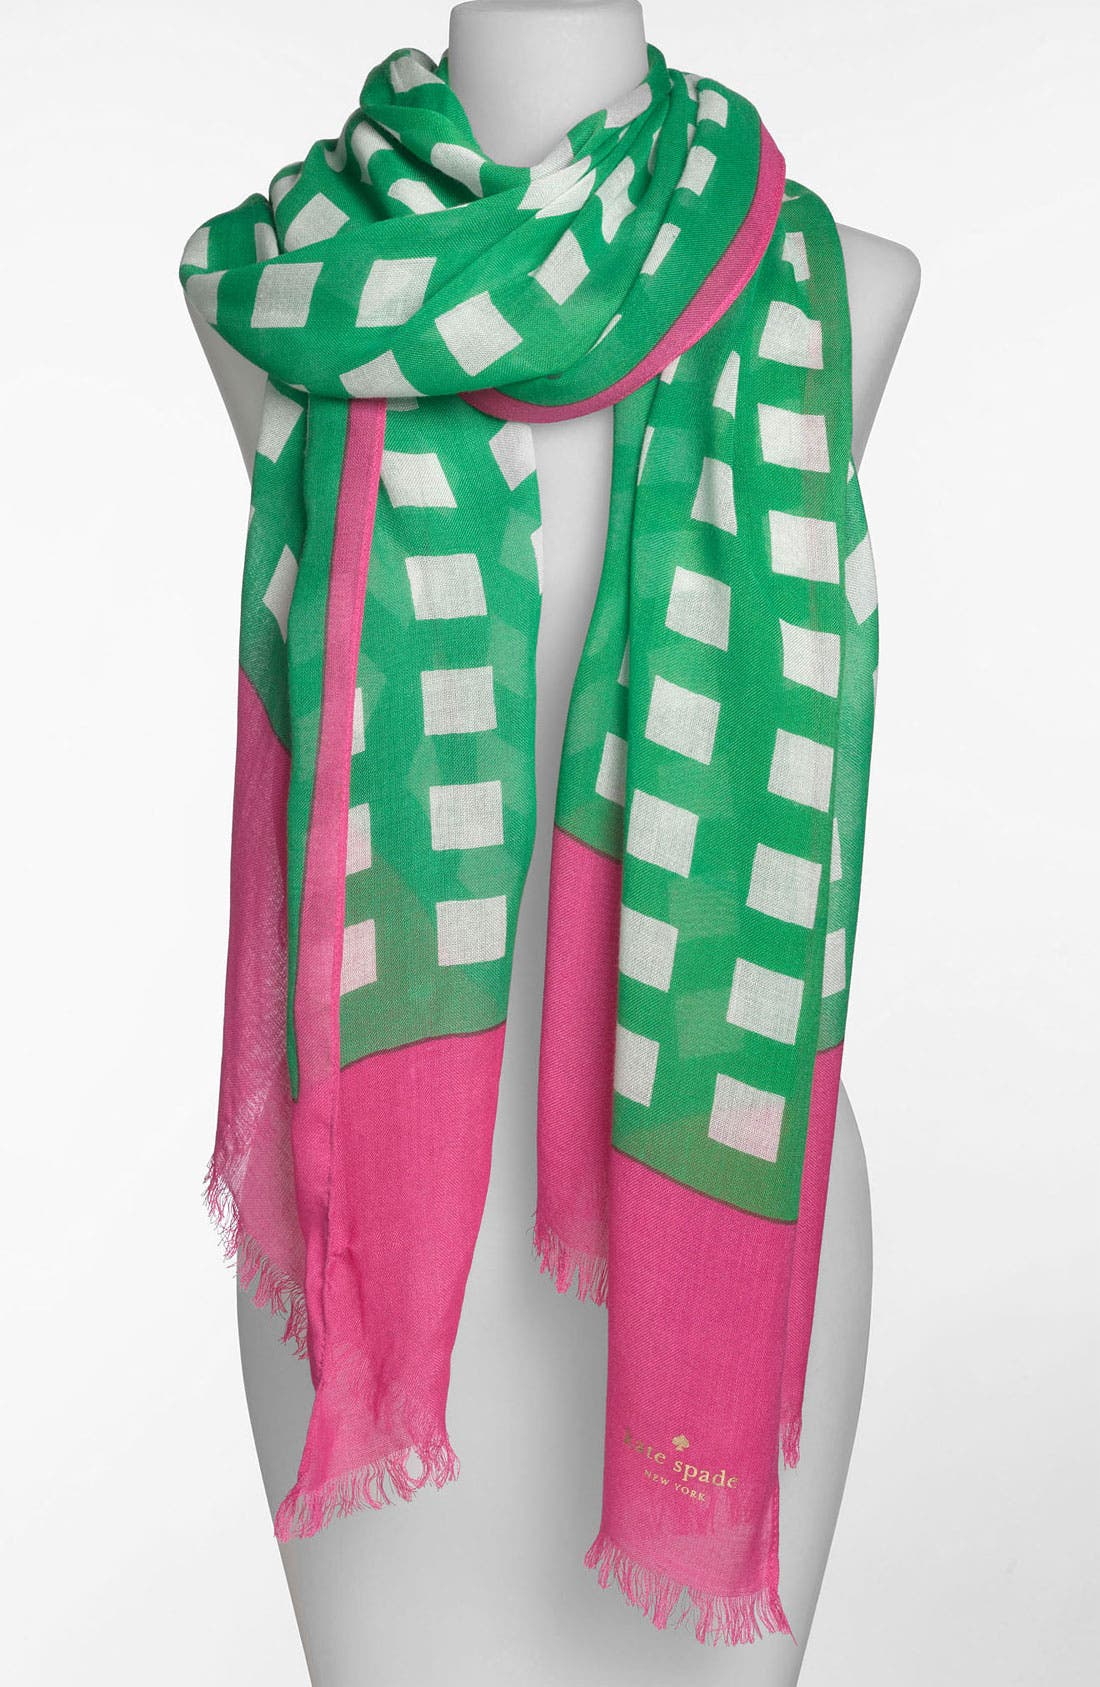 Main Image - kate spade new york 'pop art' scarf